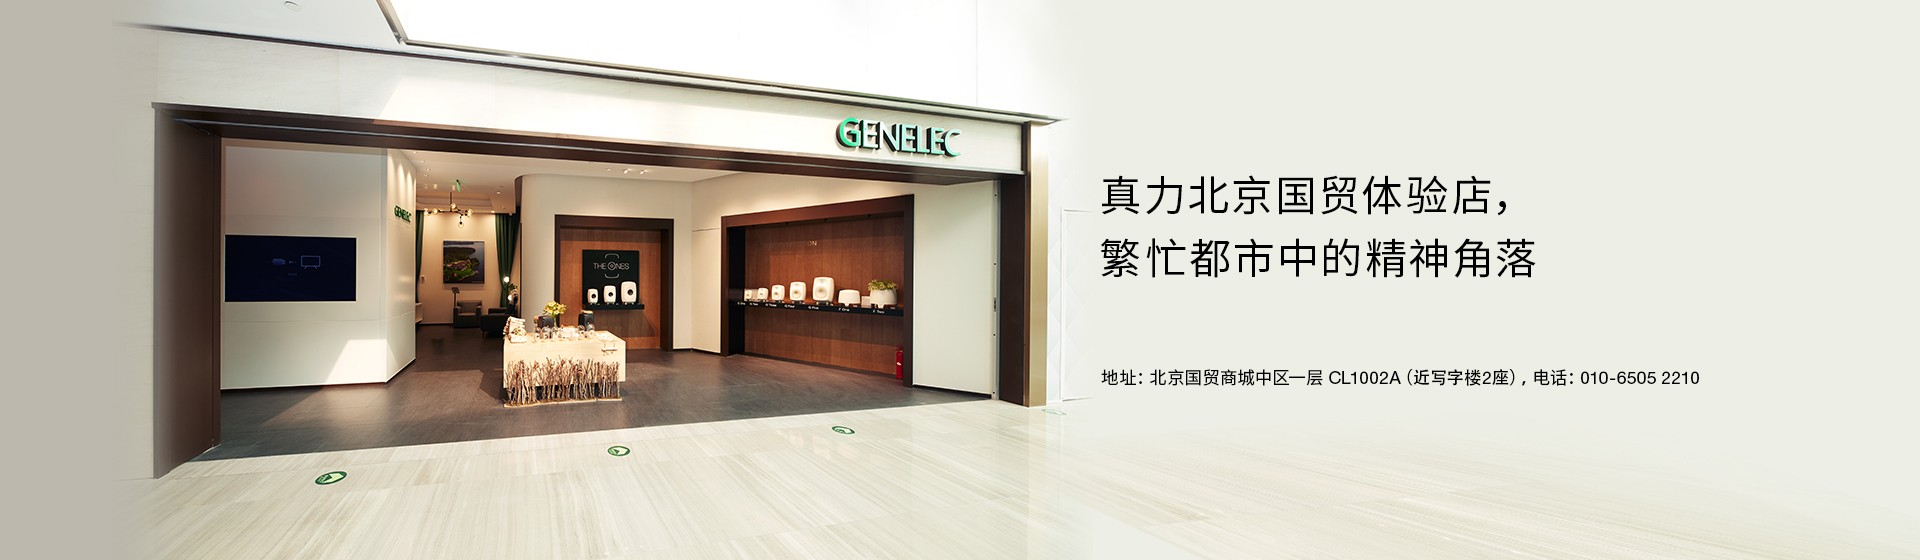 Genelec真力中文官方网站